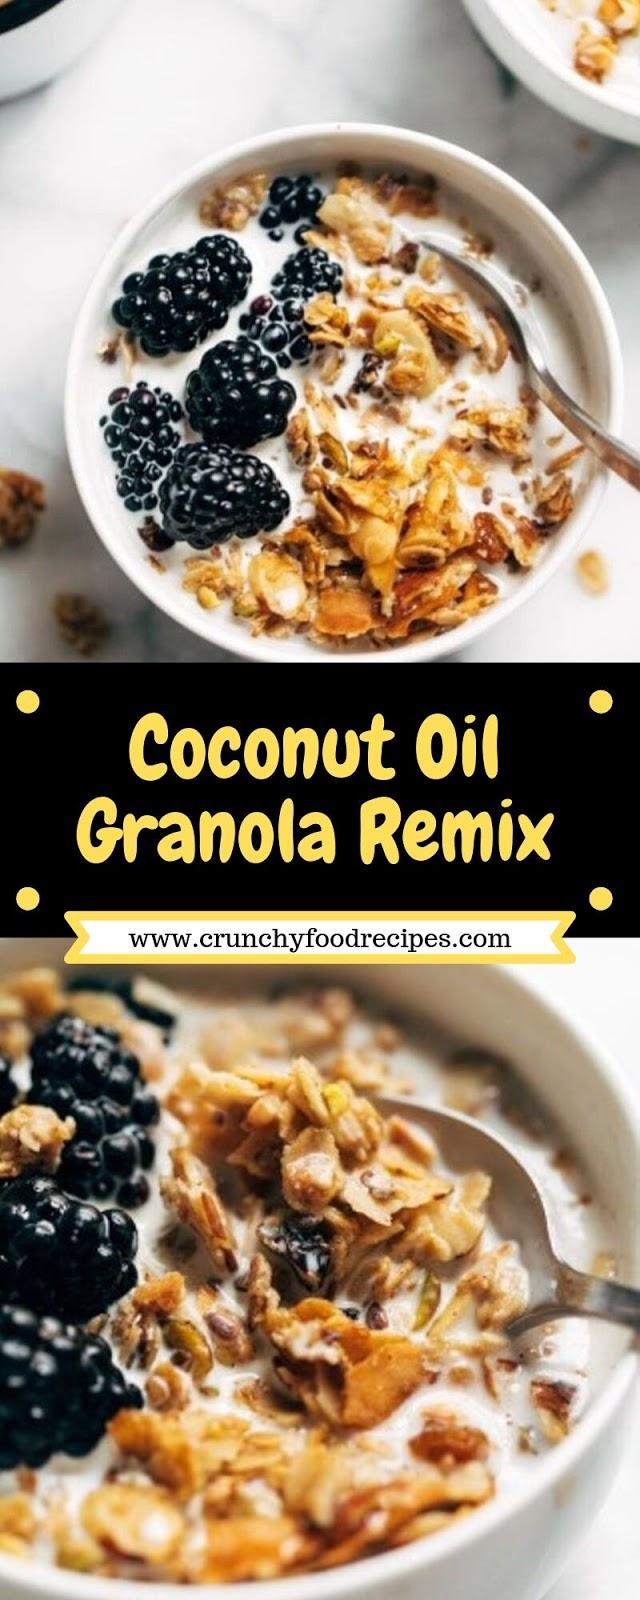 Coconut Oil Granola Remix